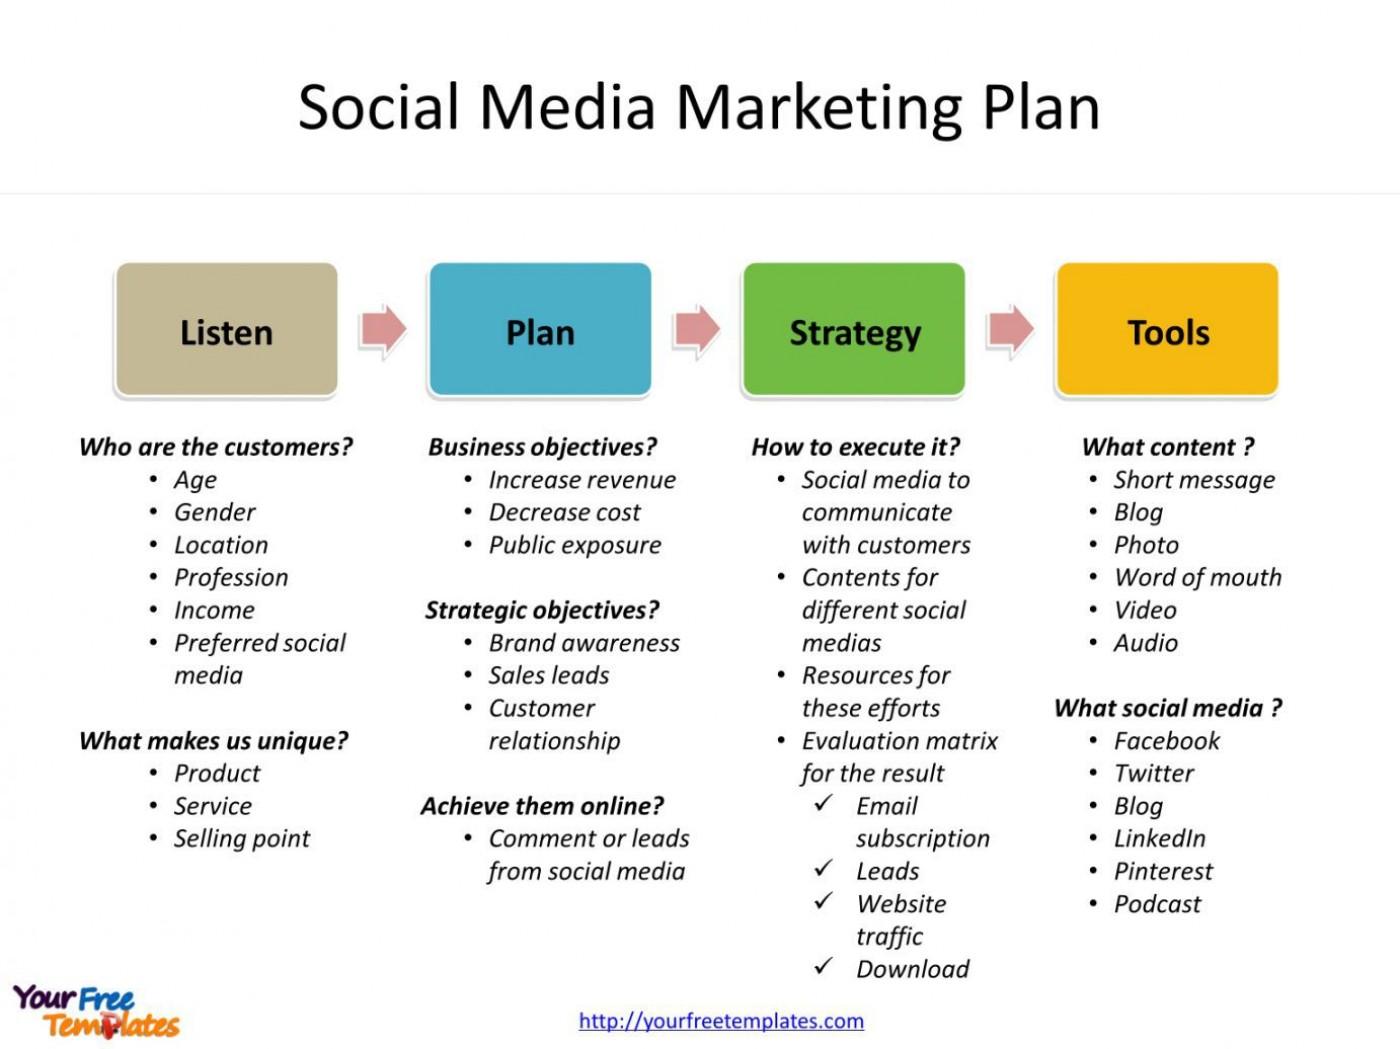 000 Magnificent Social Media Marketing Plan Template Doc Photo 1400